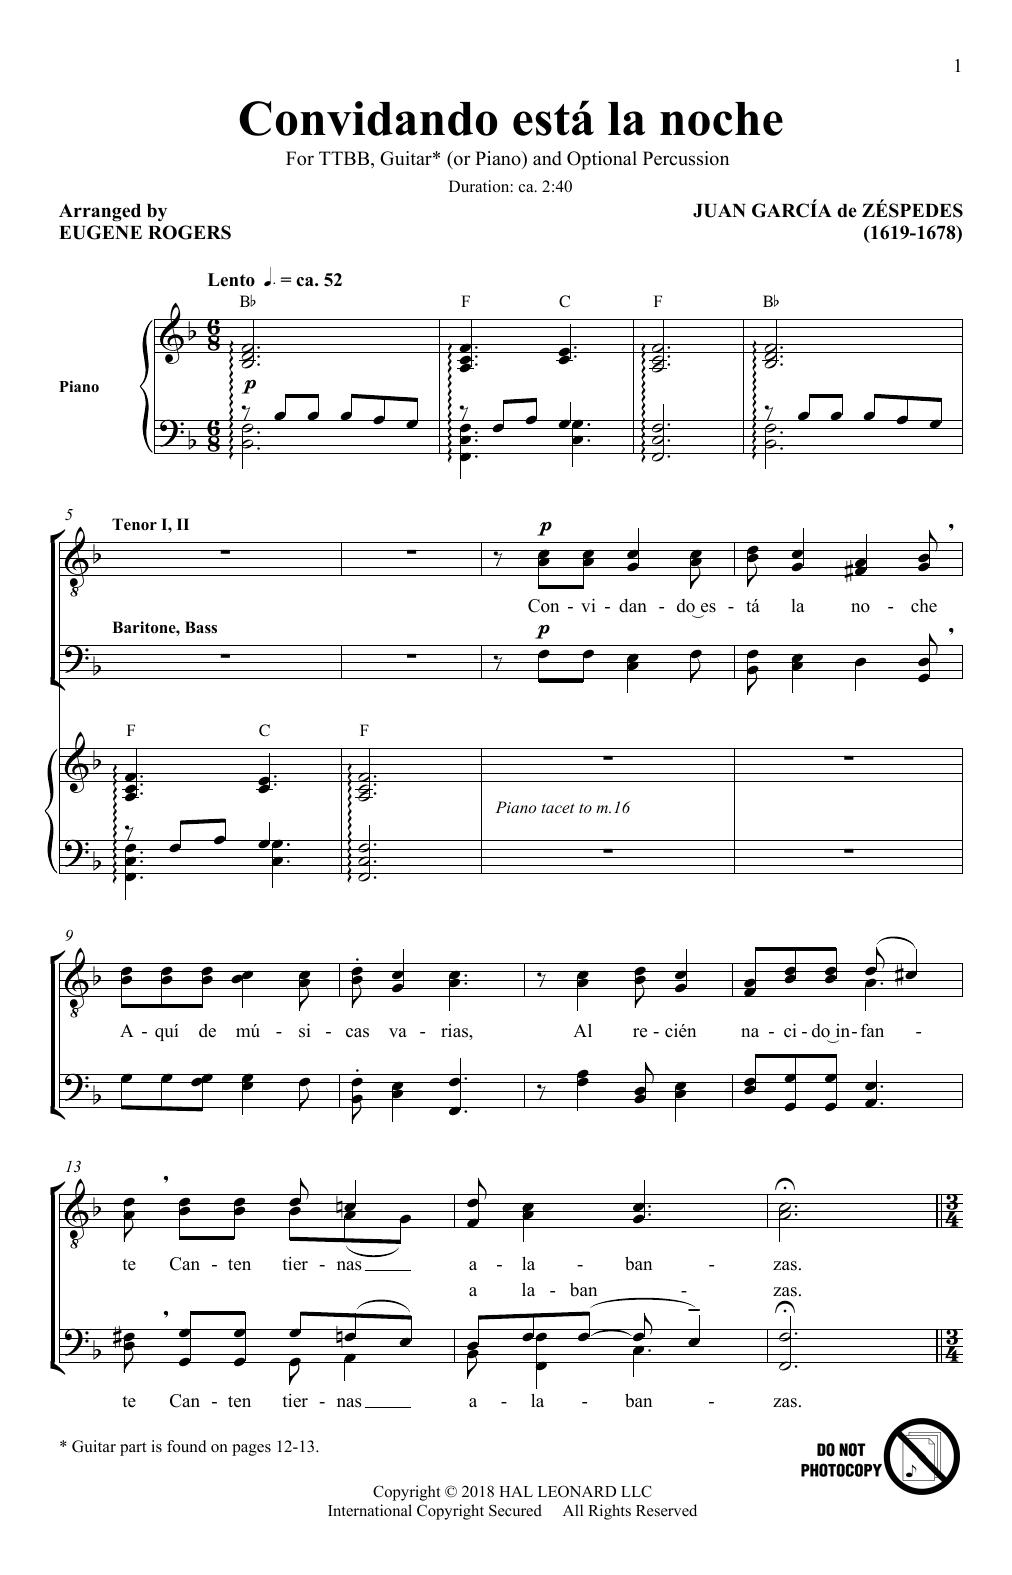 Convidando Esta La Noche (arr. Eugene Rogers) (TTBB Choir)